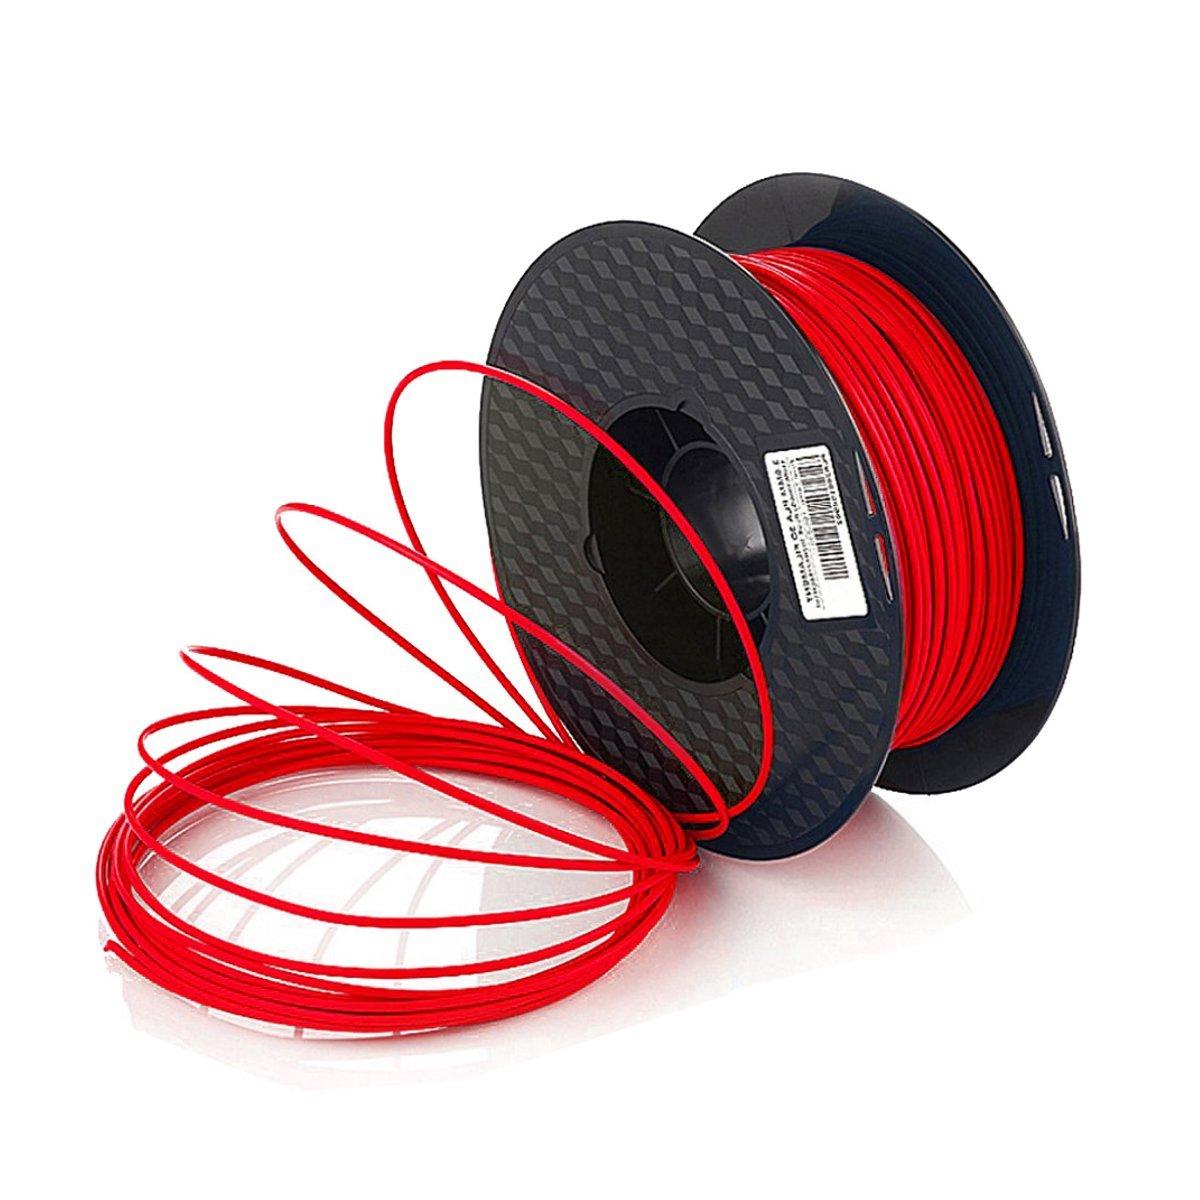 3d impresora filamento, Drillpro Pla Printer Filamento Spool, 1.75 ...